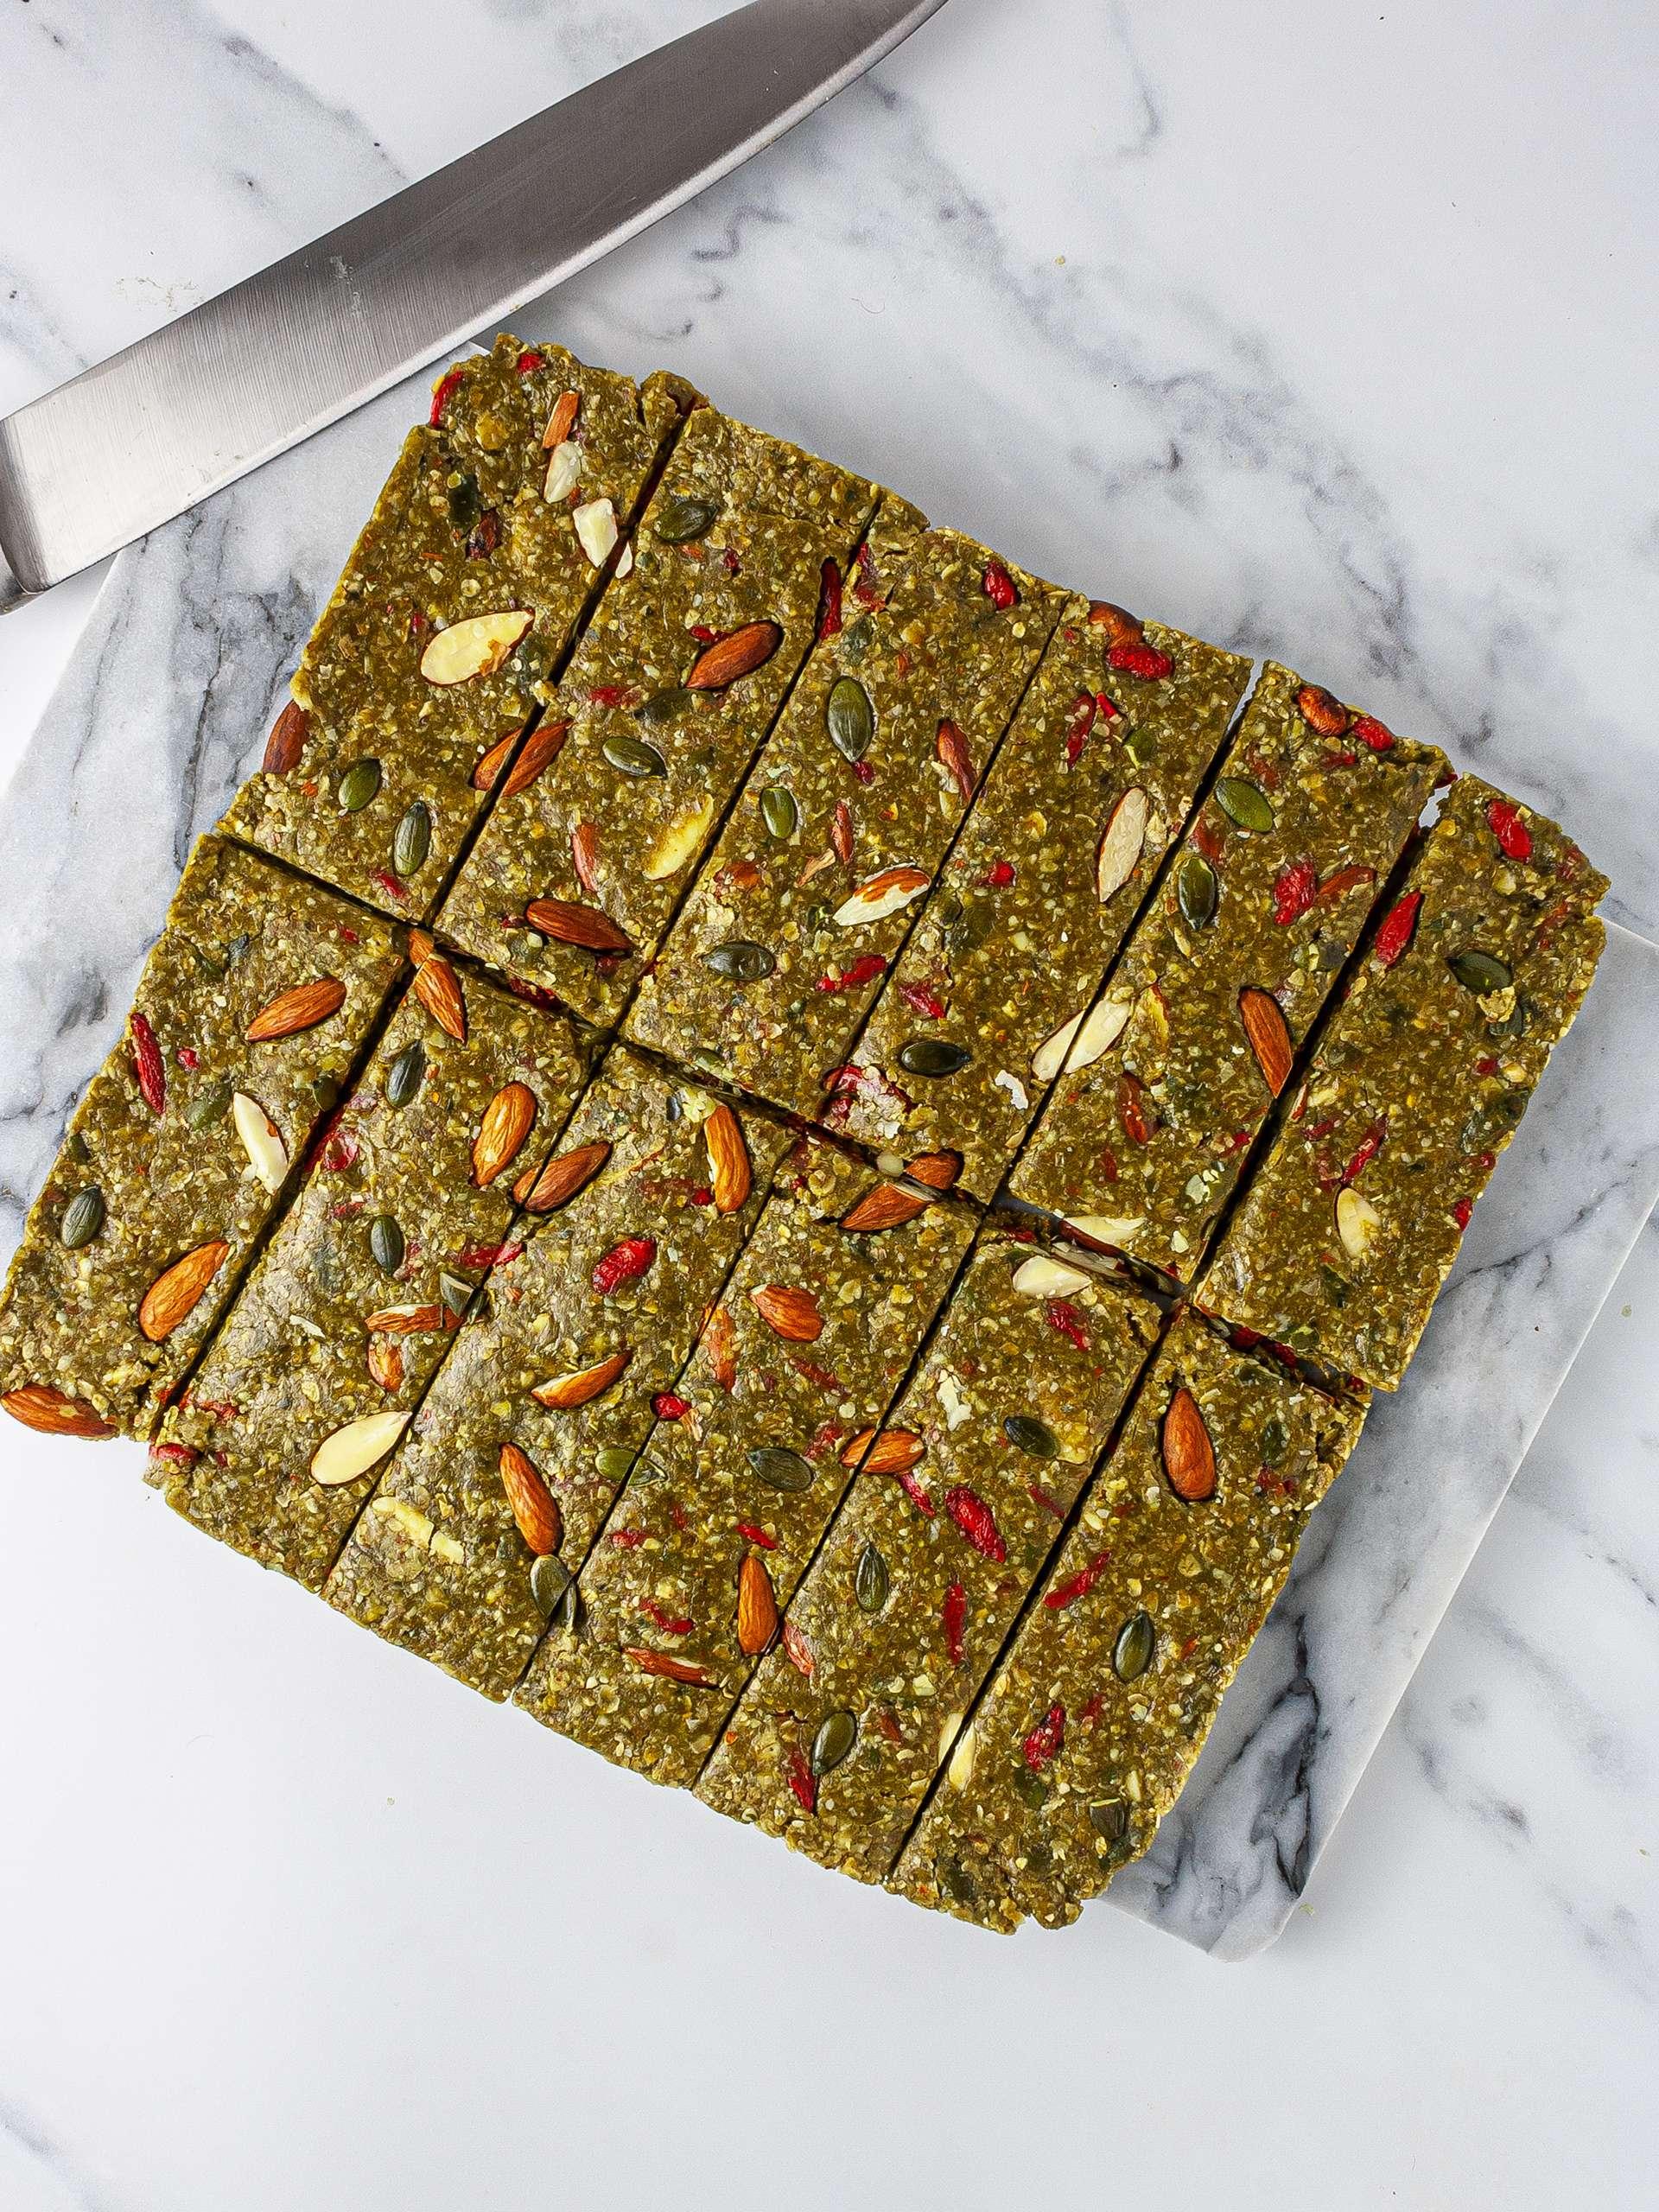 Matcha granola bars sliced into servings.